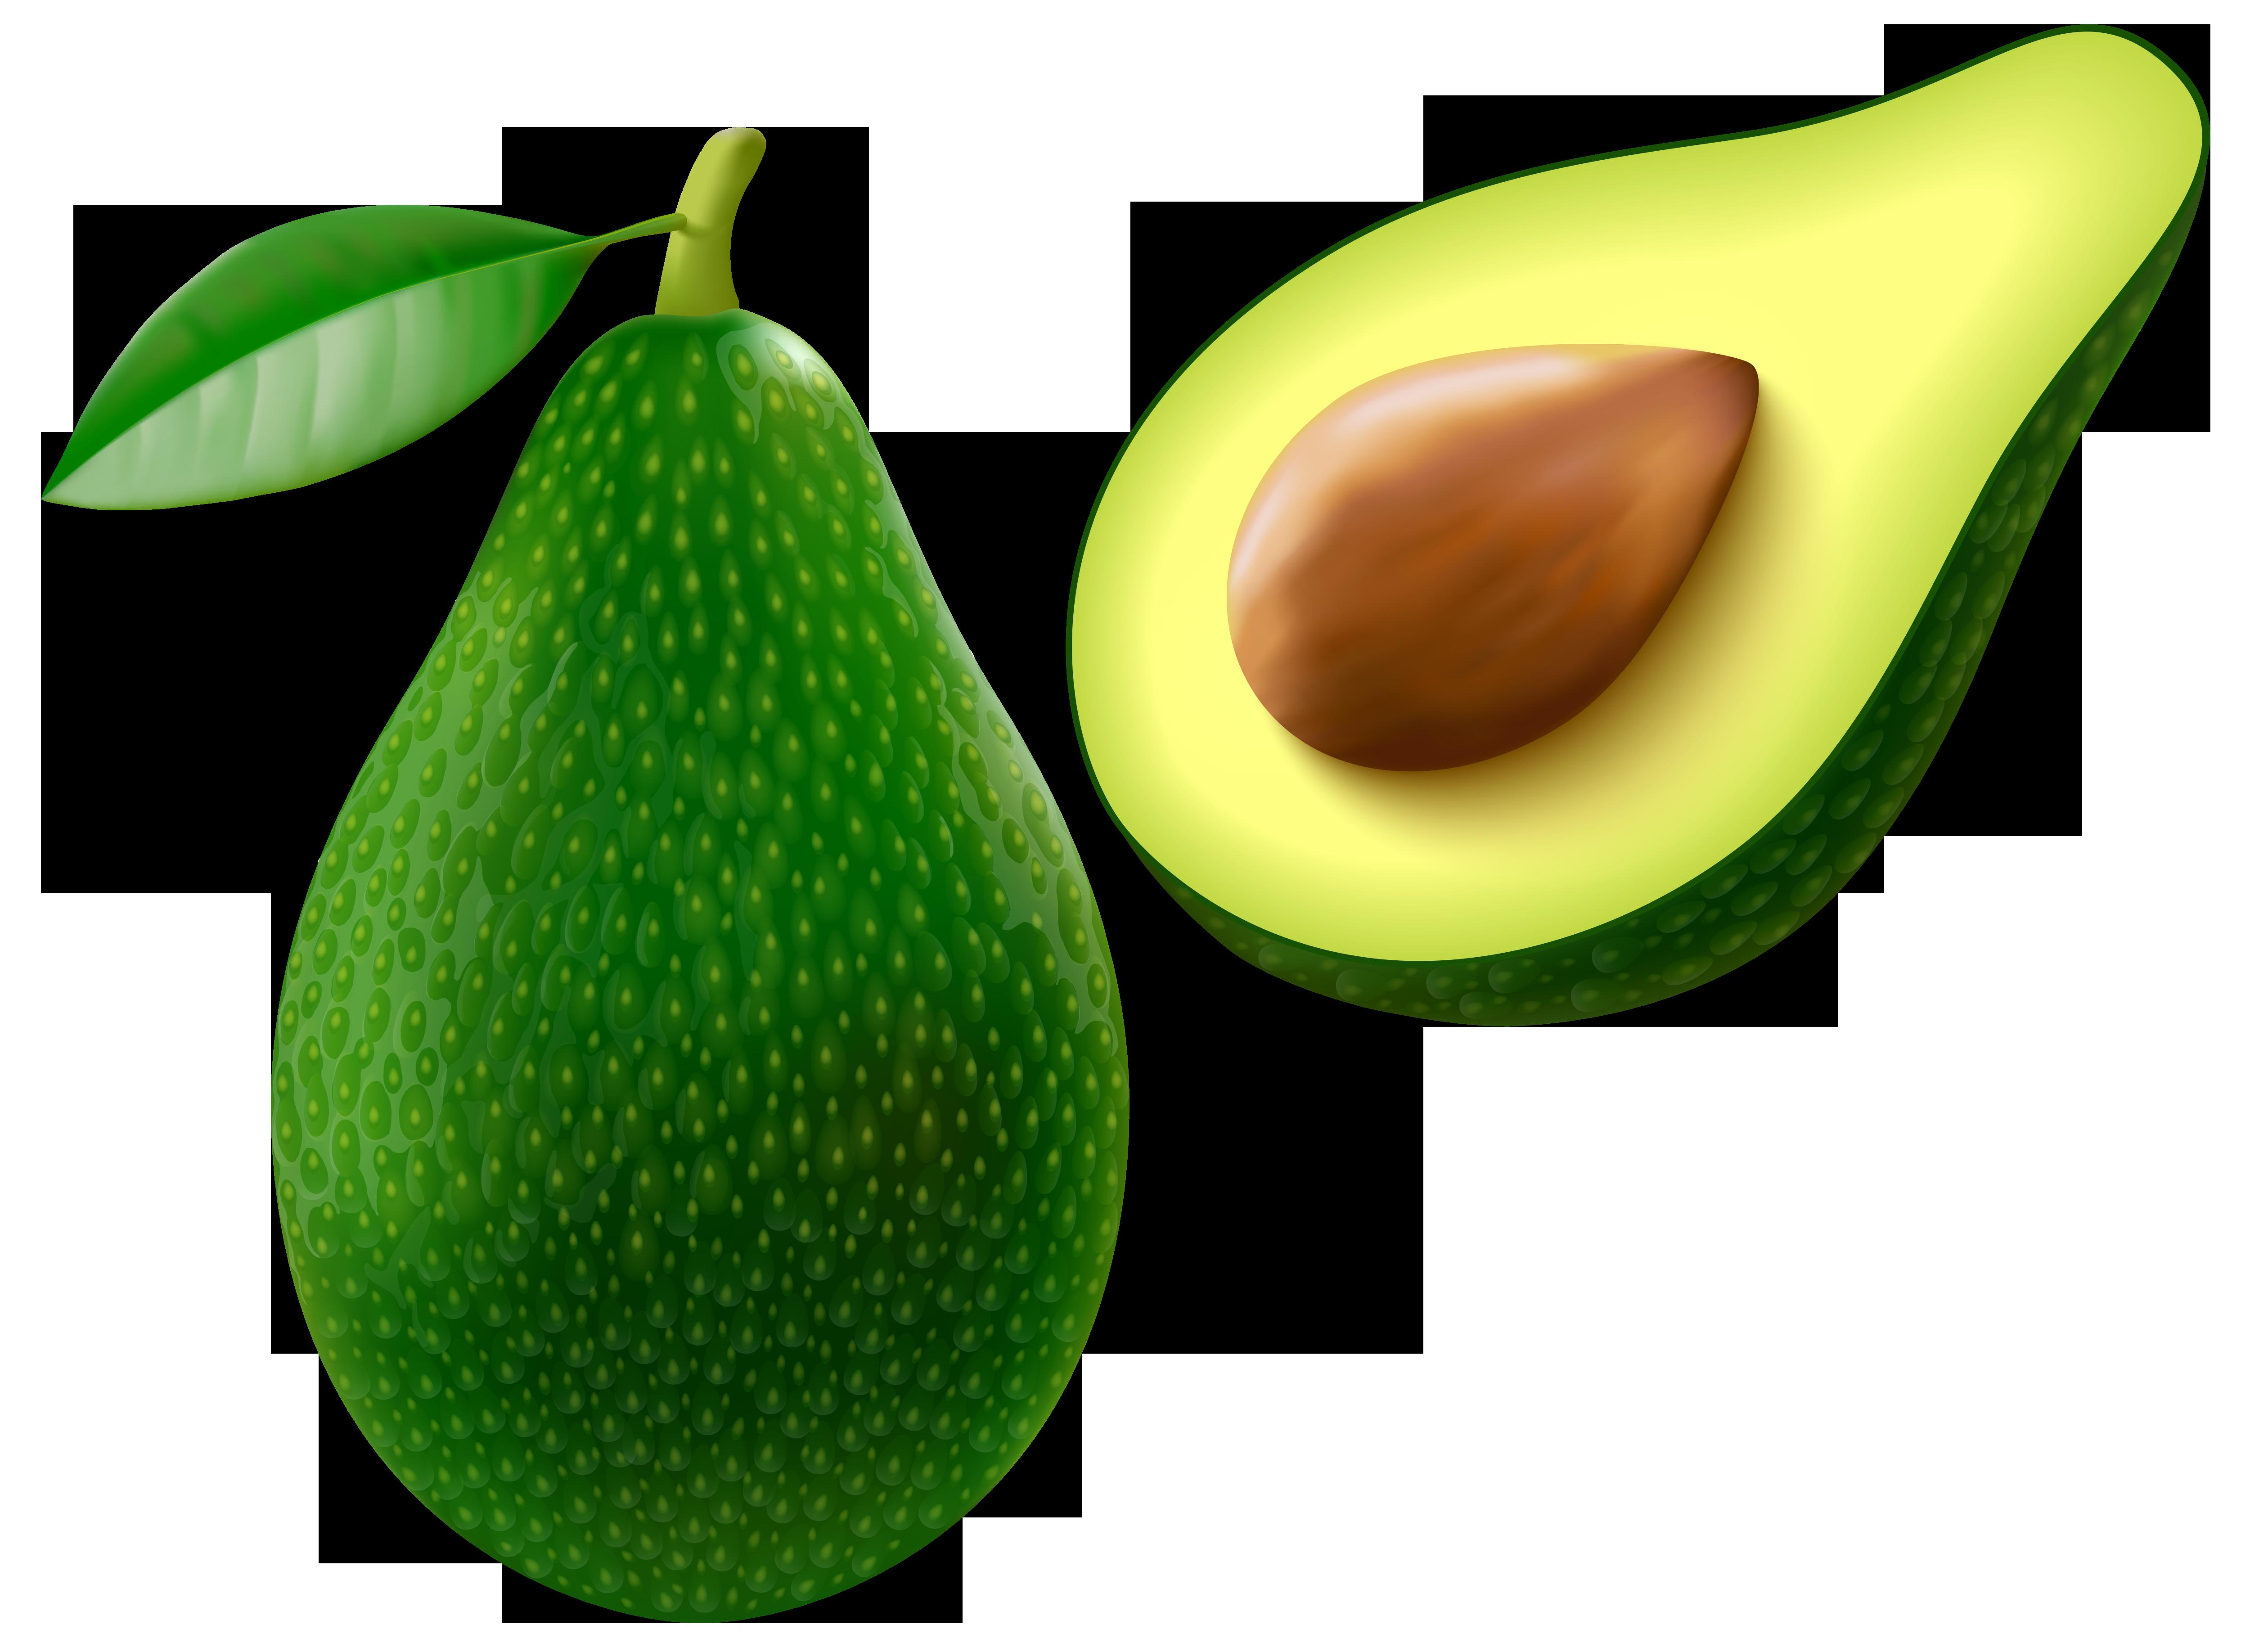 Free clipart images avacado. Avocado png vector image